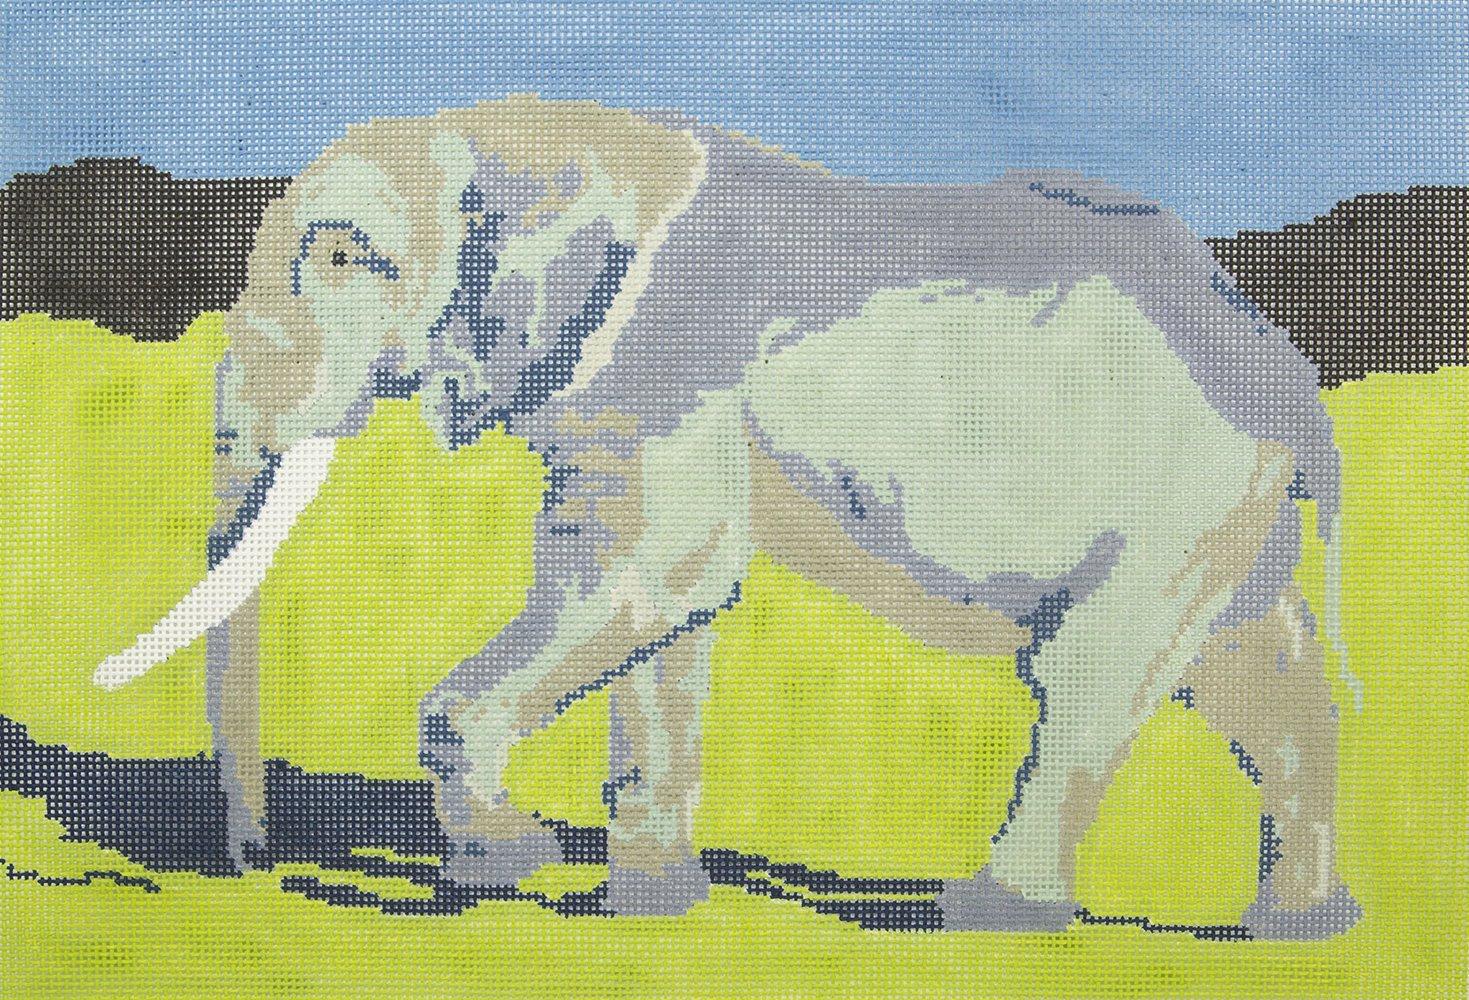 JKNA72 Elephant Judy Keenan